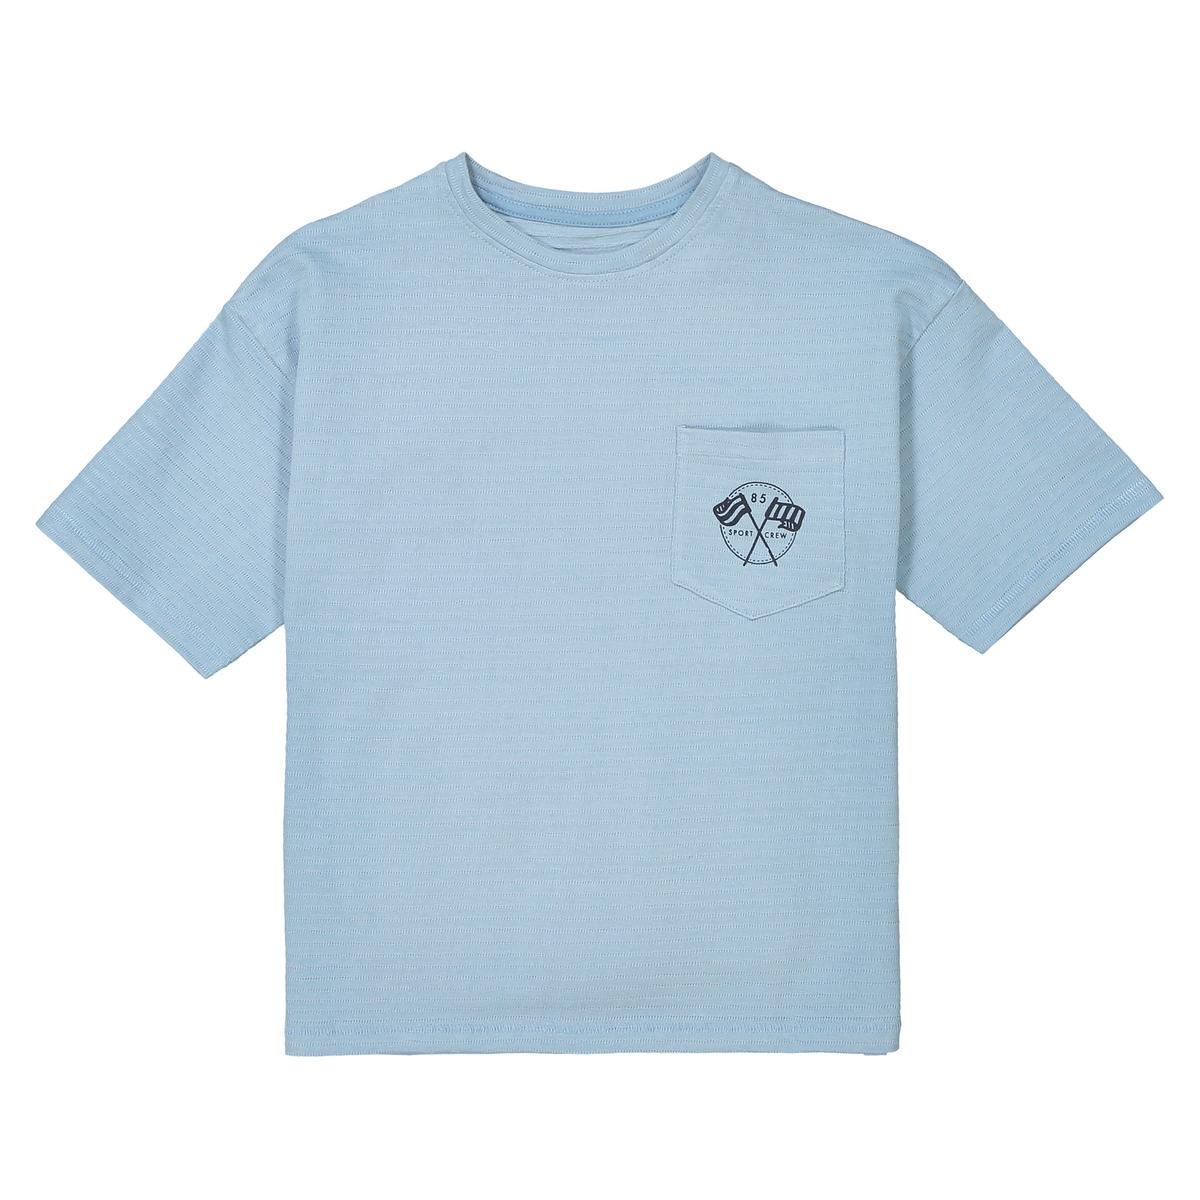 T-shirt oversize de gola redonda, 3-12 anos